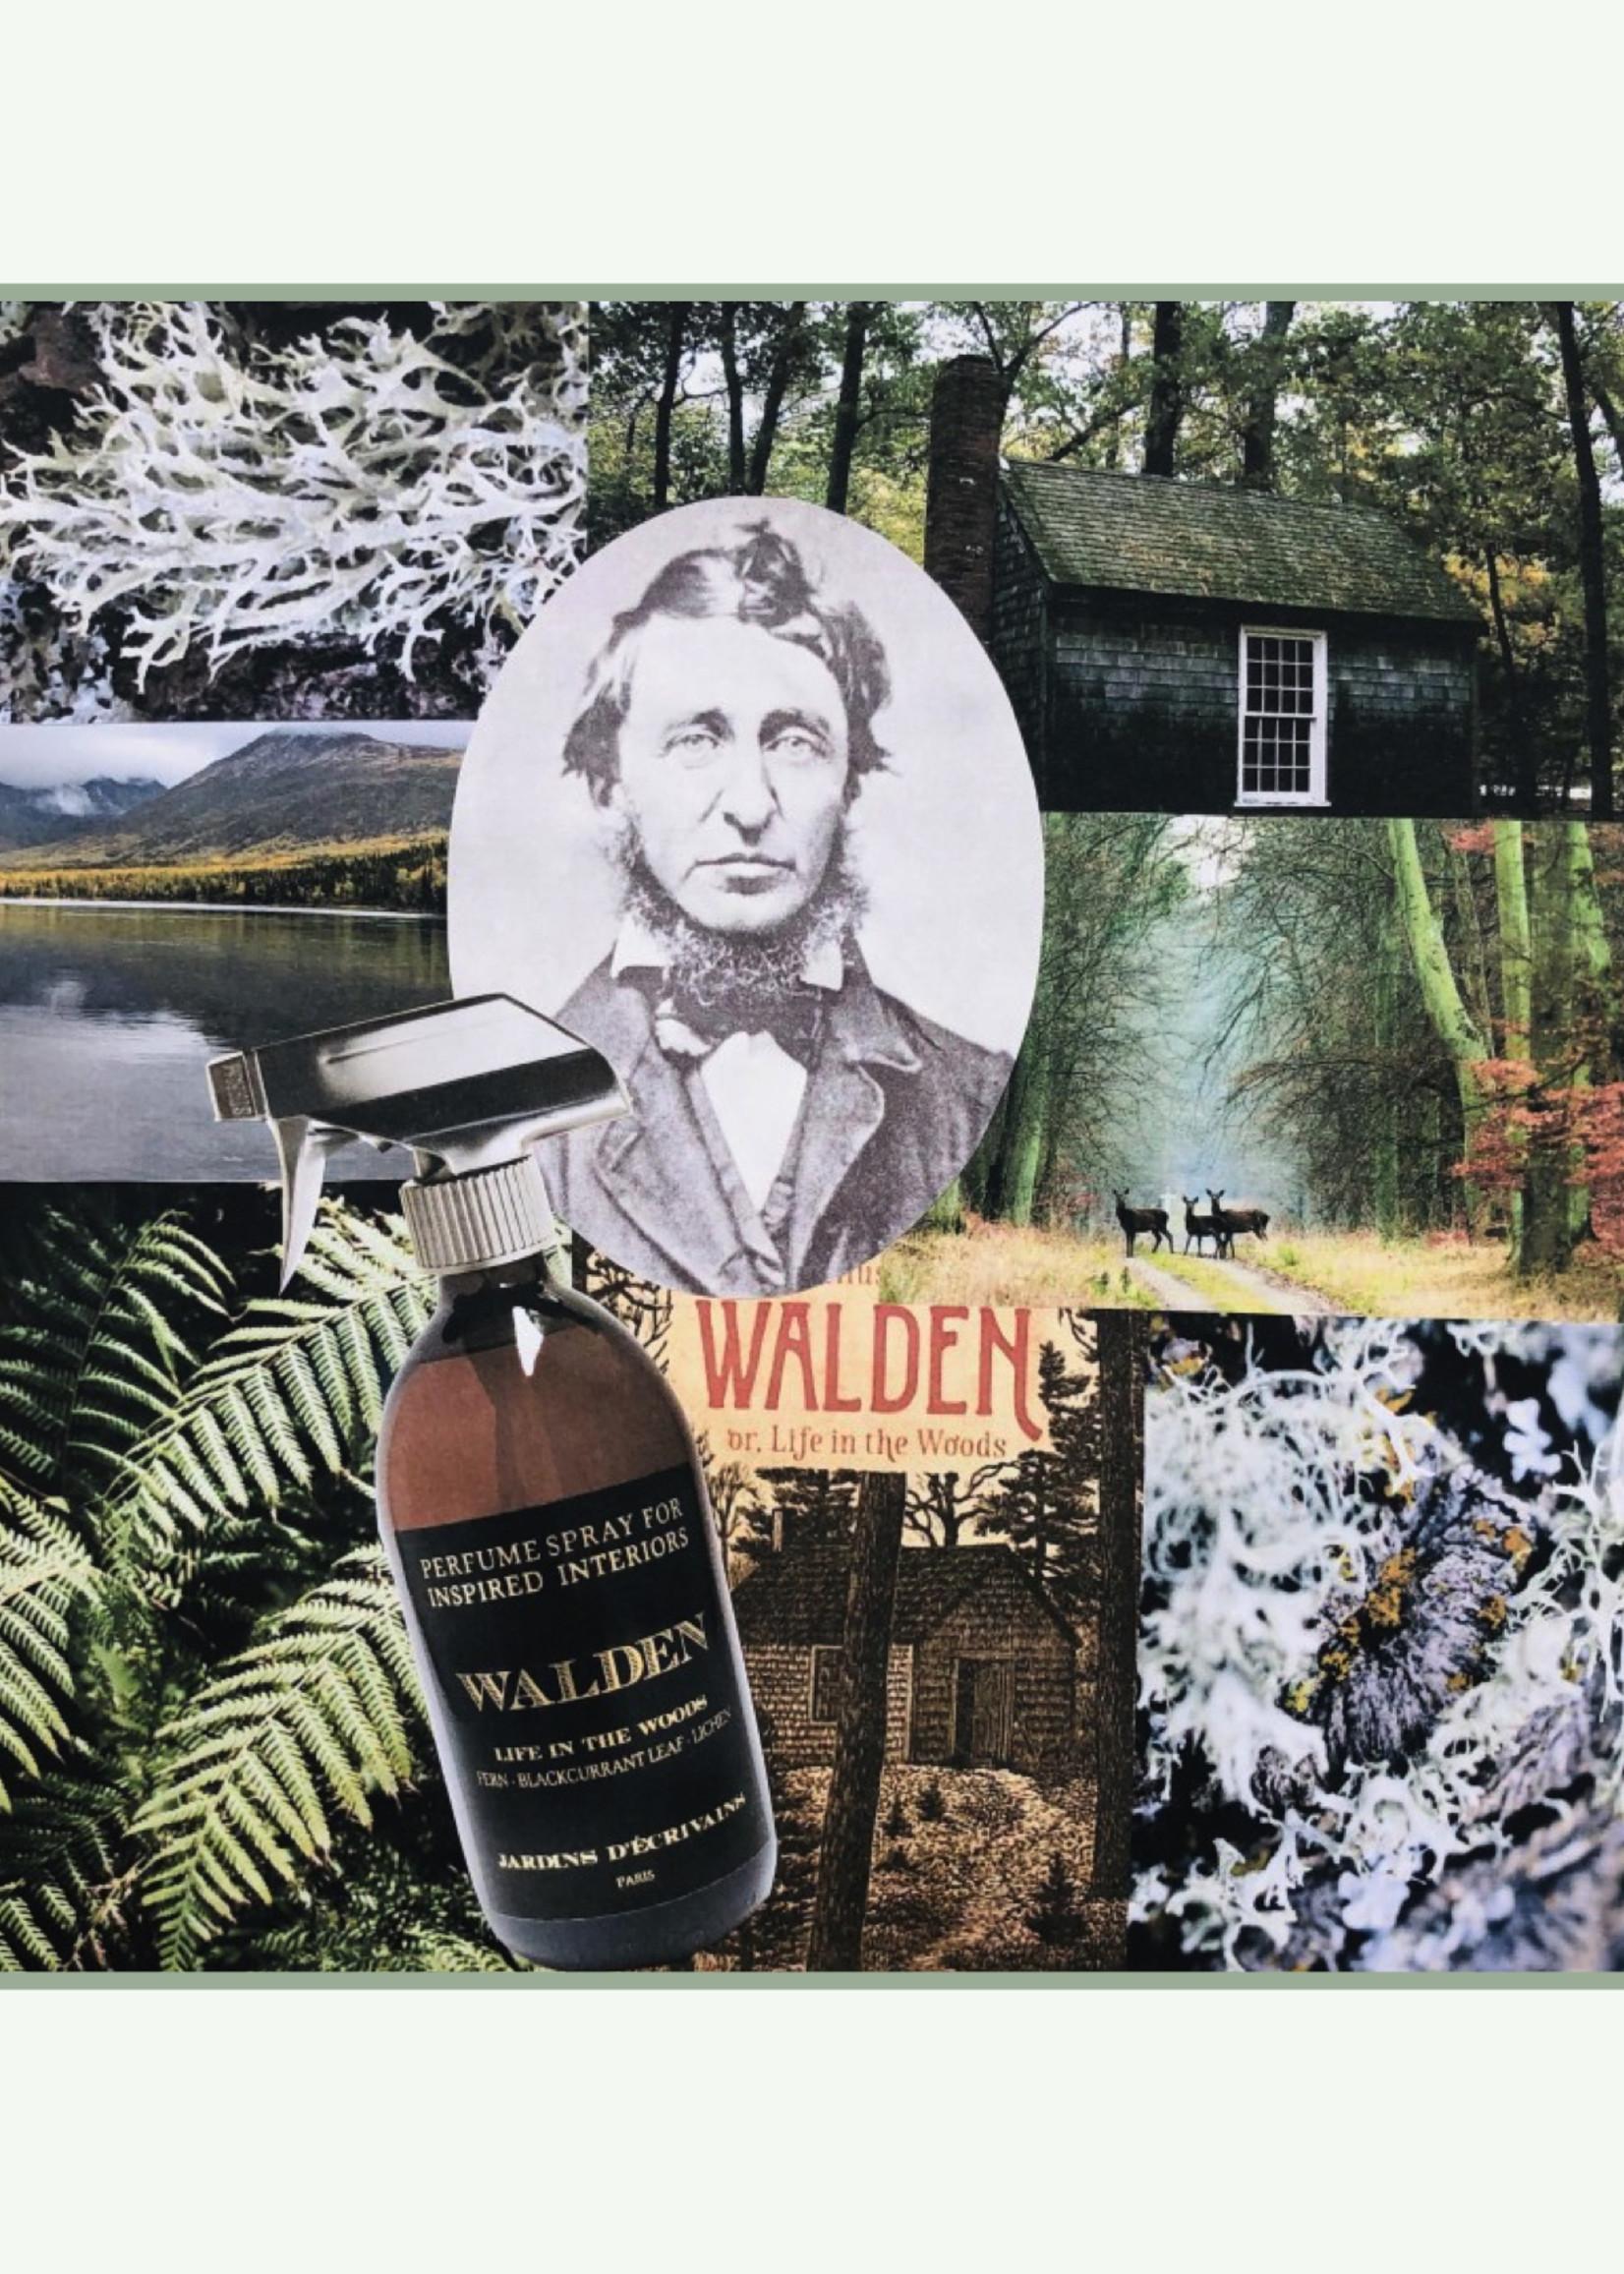 Jardins d'ecrivains Jardins d'écrivains - Walden - Home spray